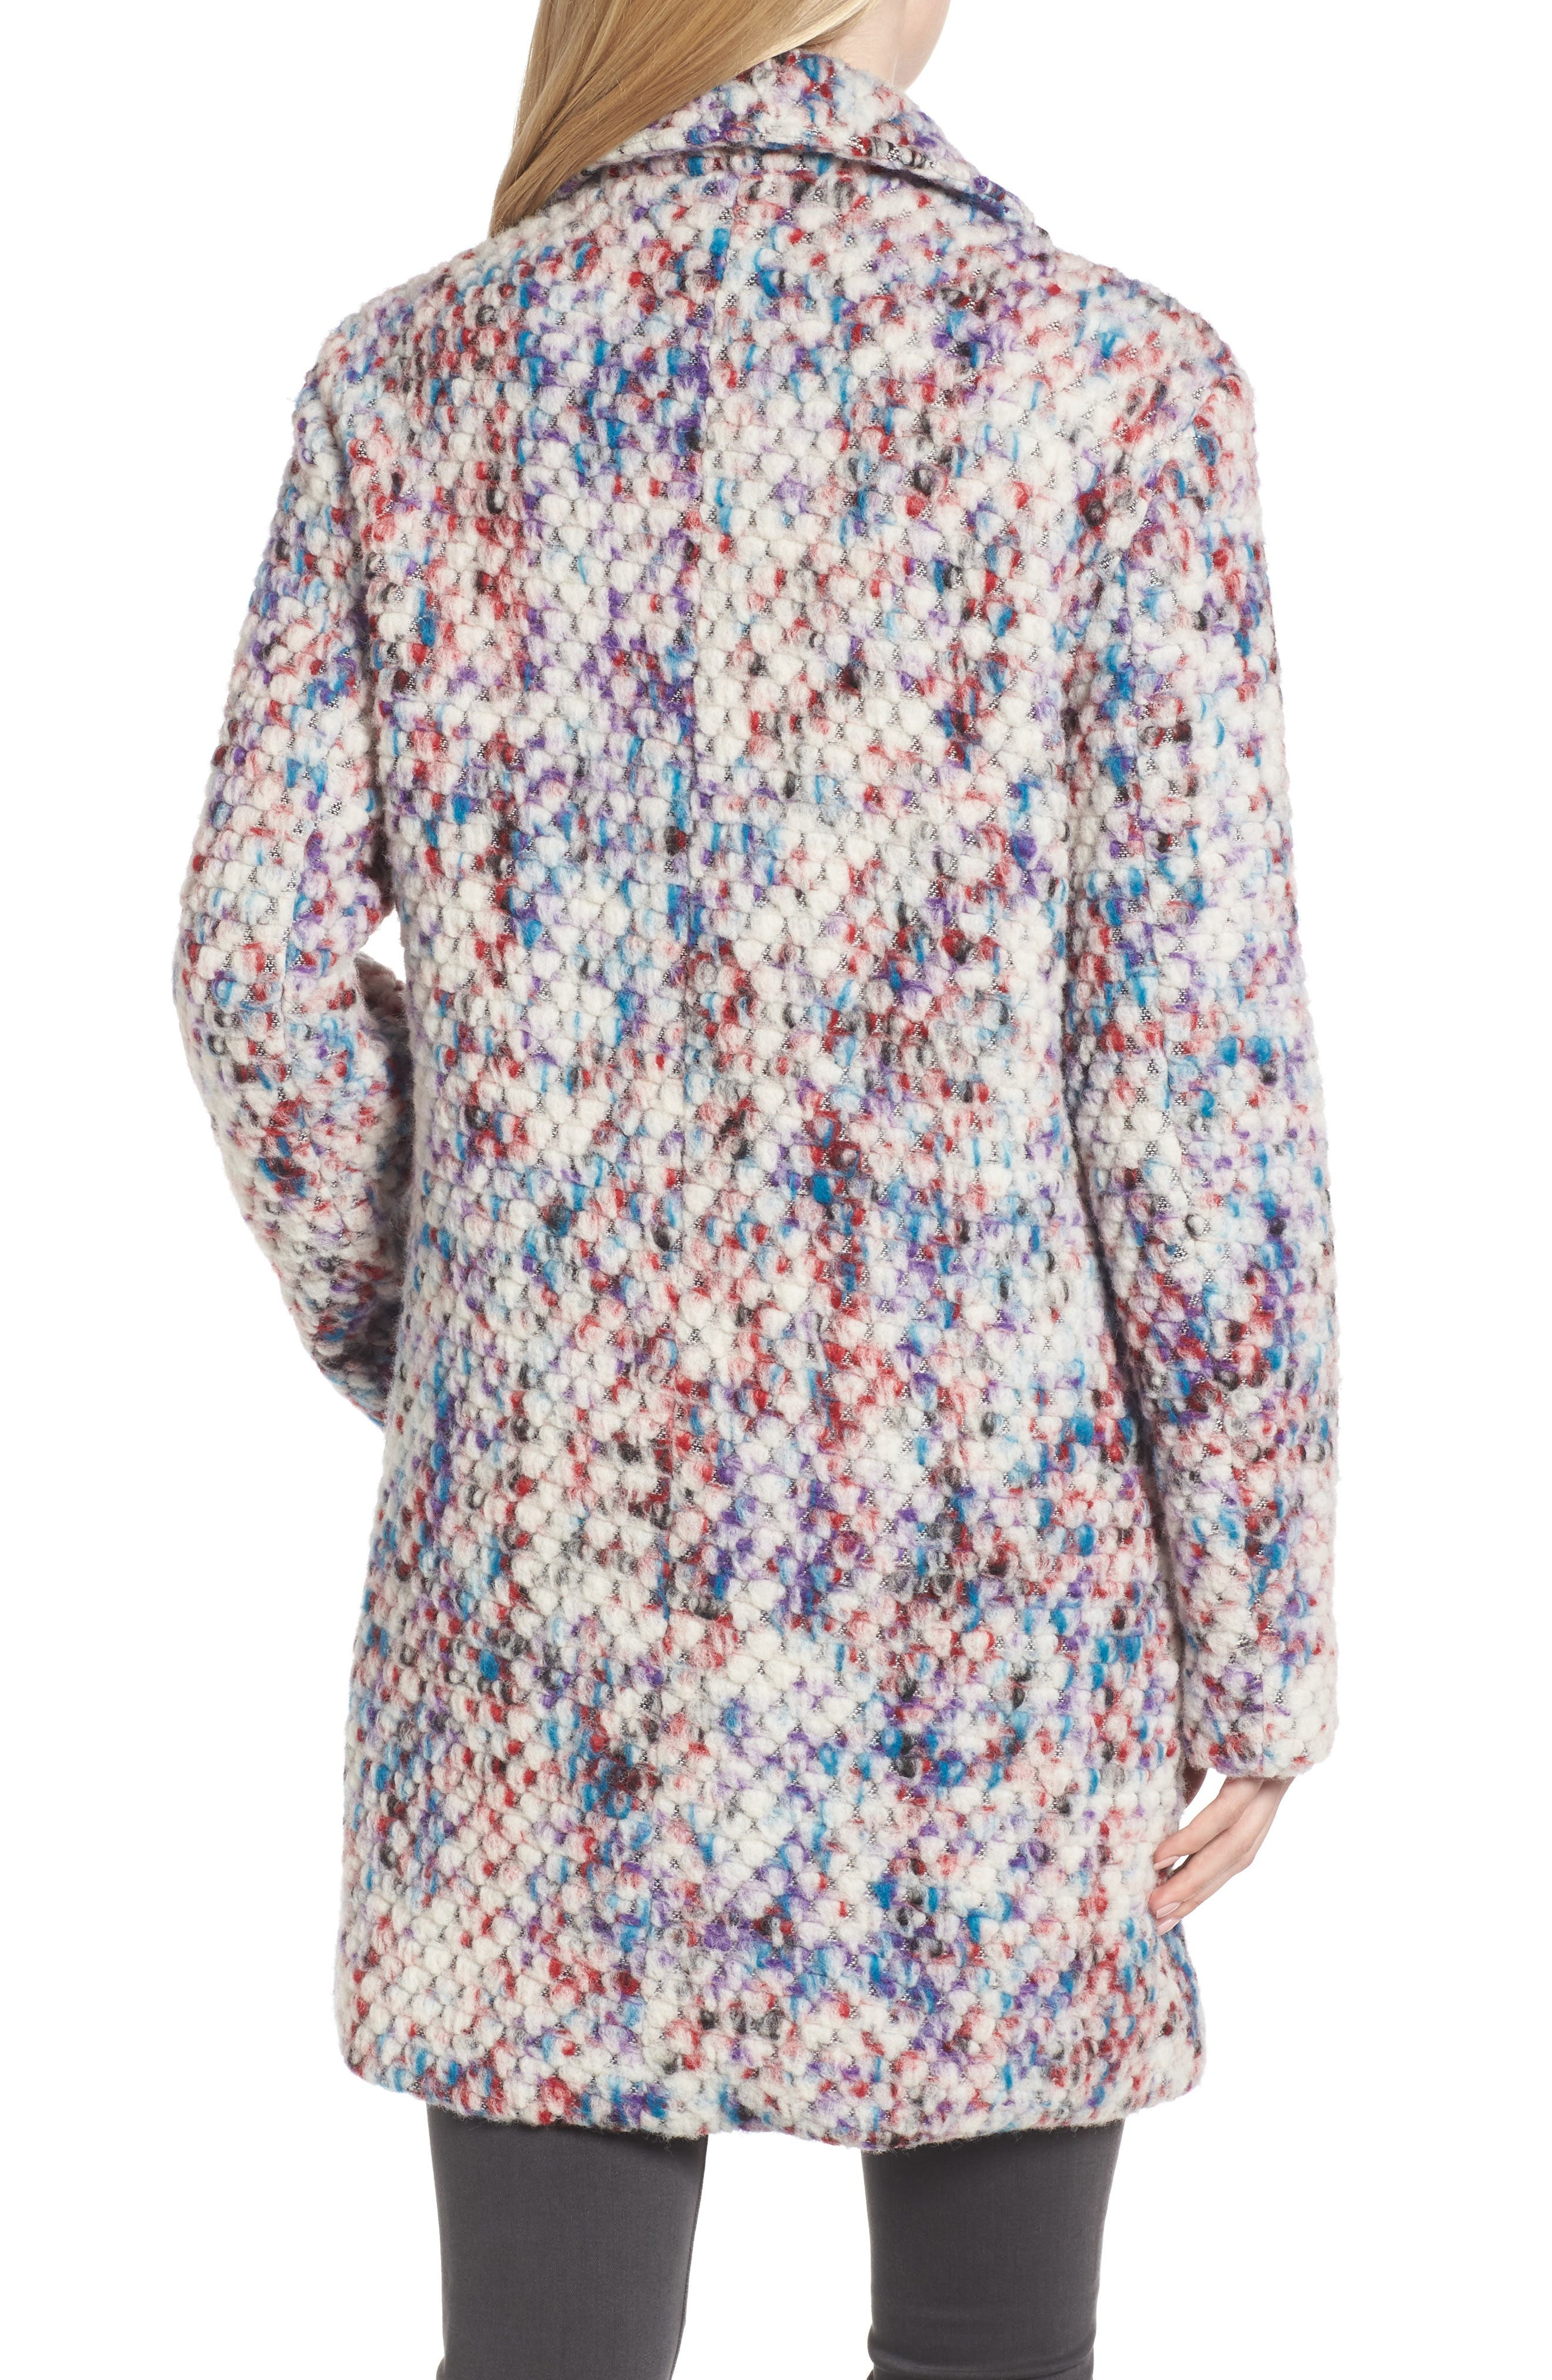 Confetti Wool Blend Coat,                             Alternate thumbnail 2, color,                             560